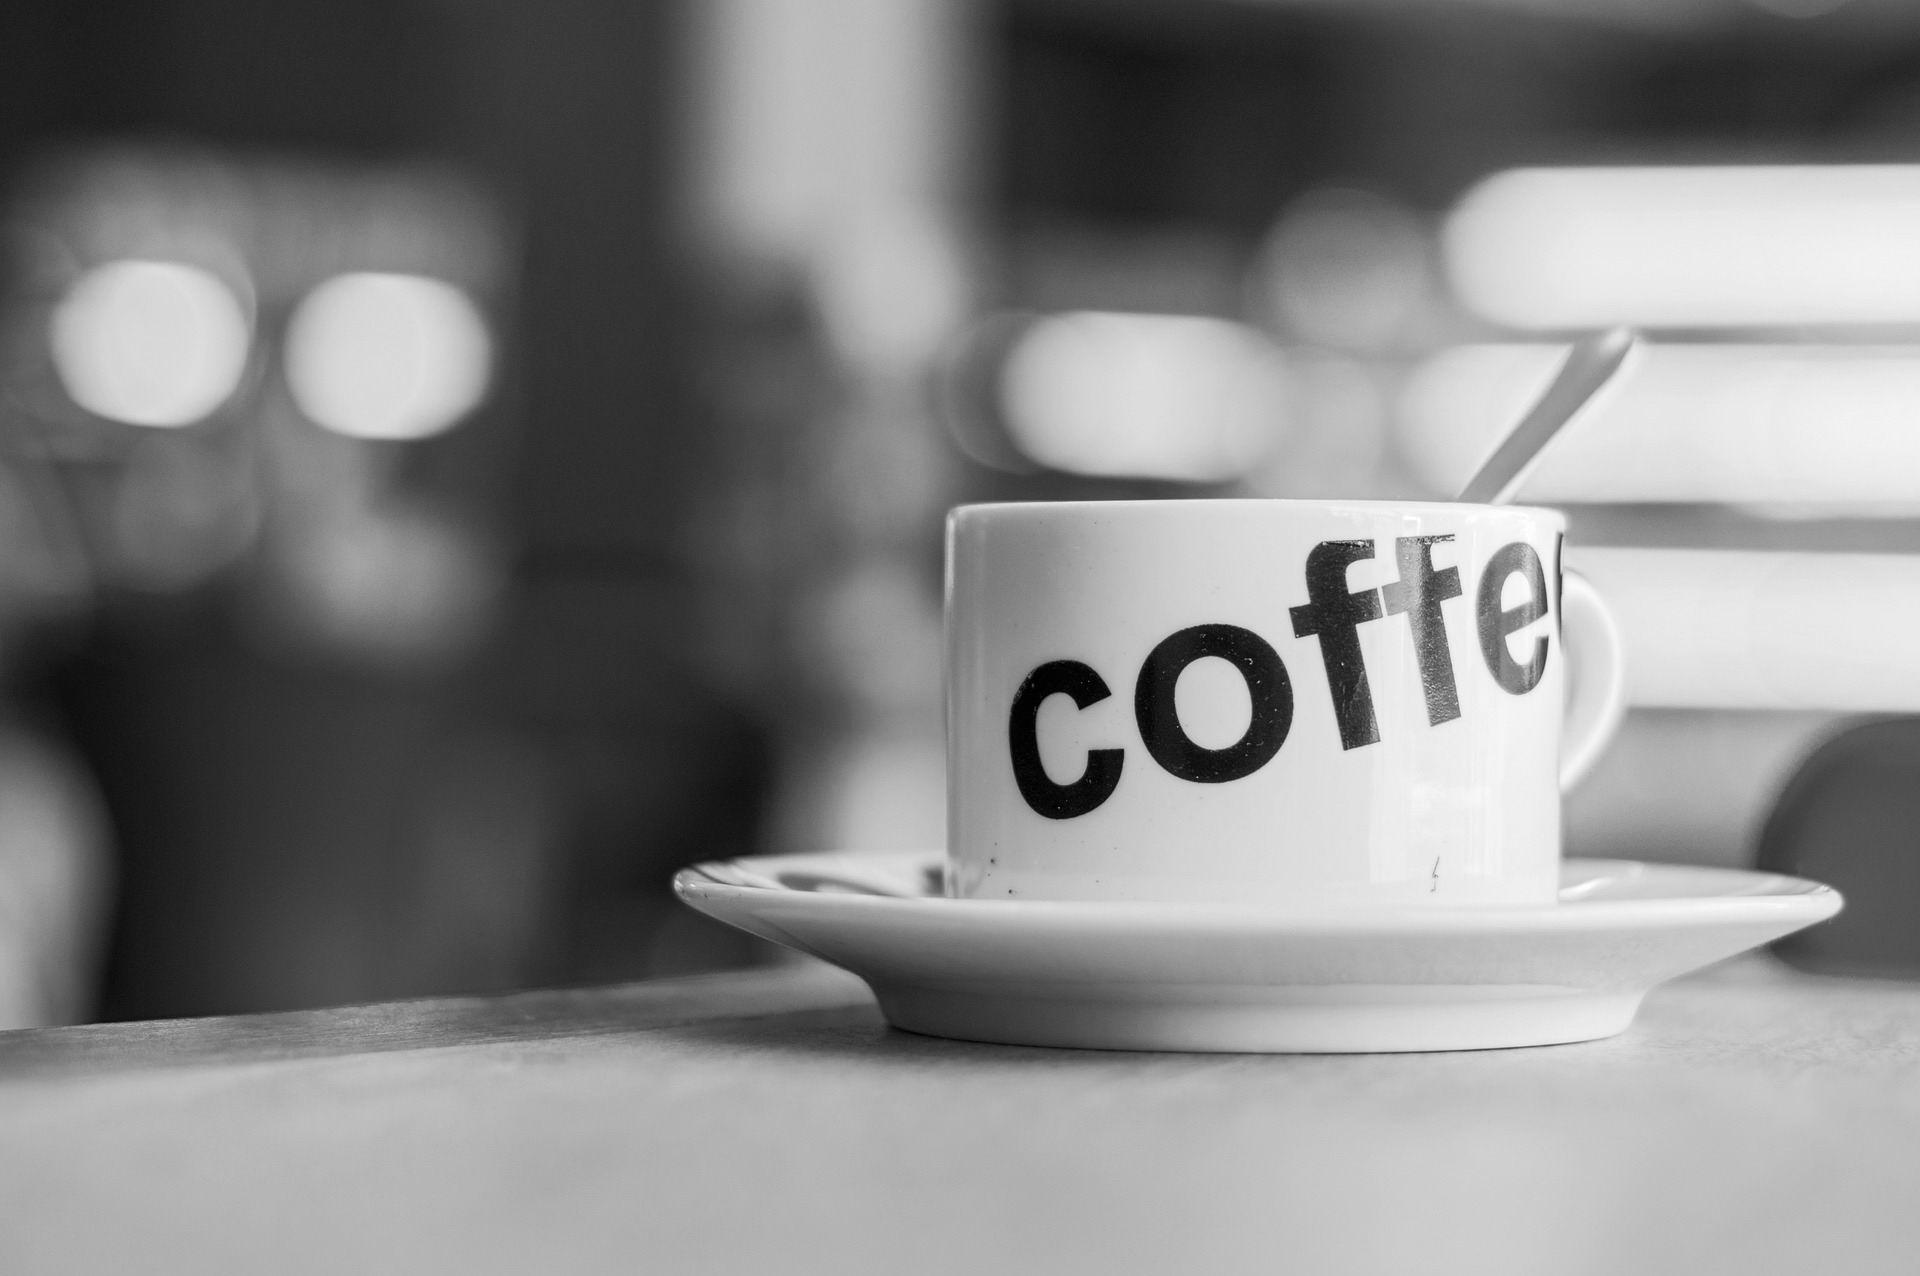 COFFEE - GIANT LOGO